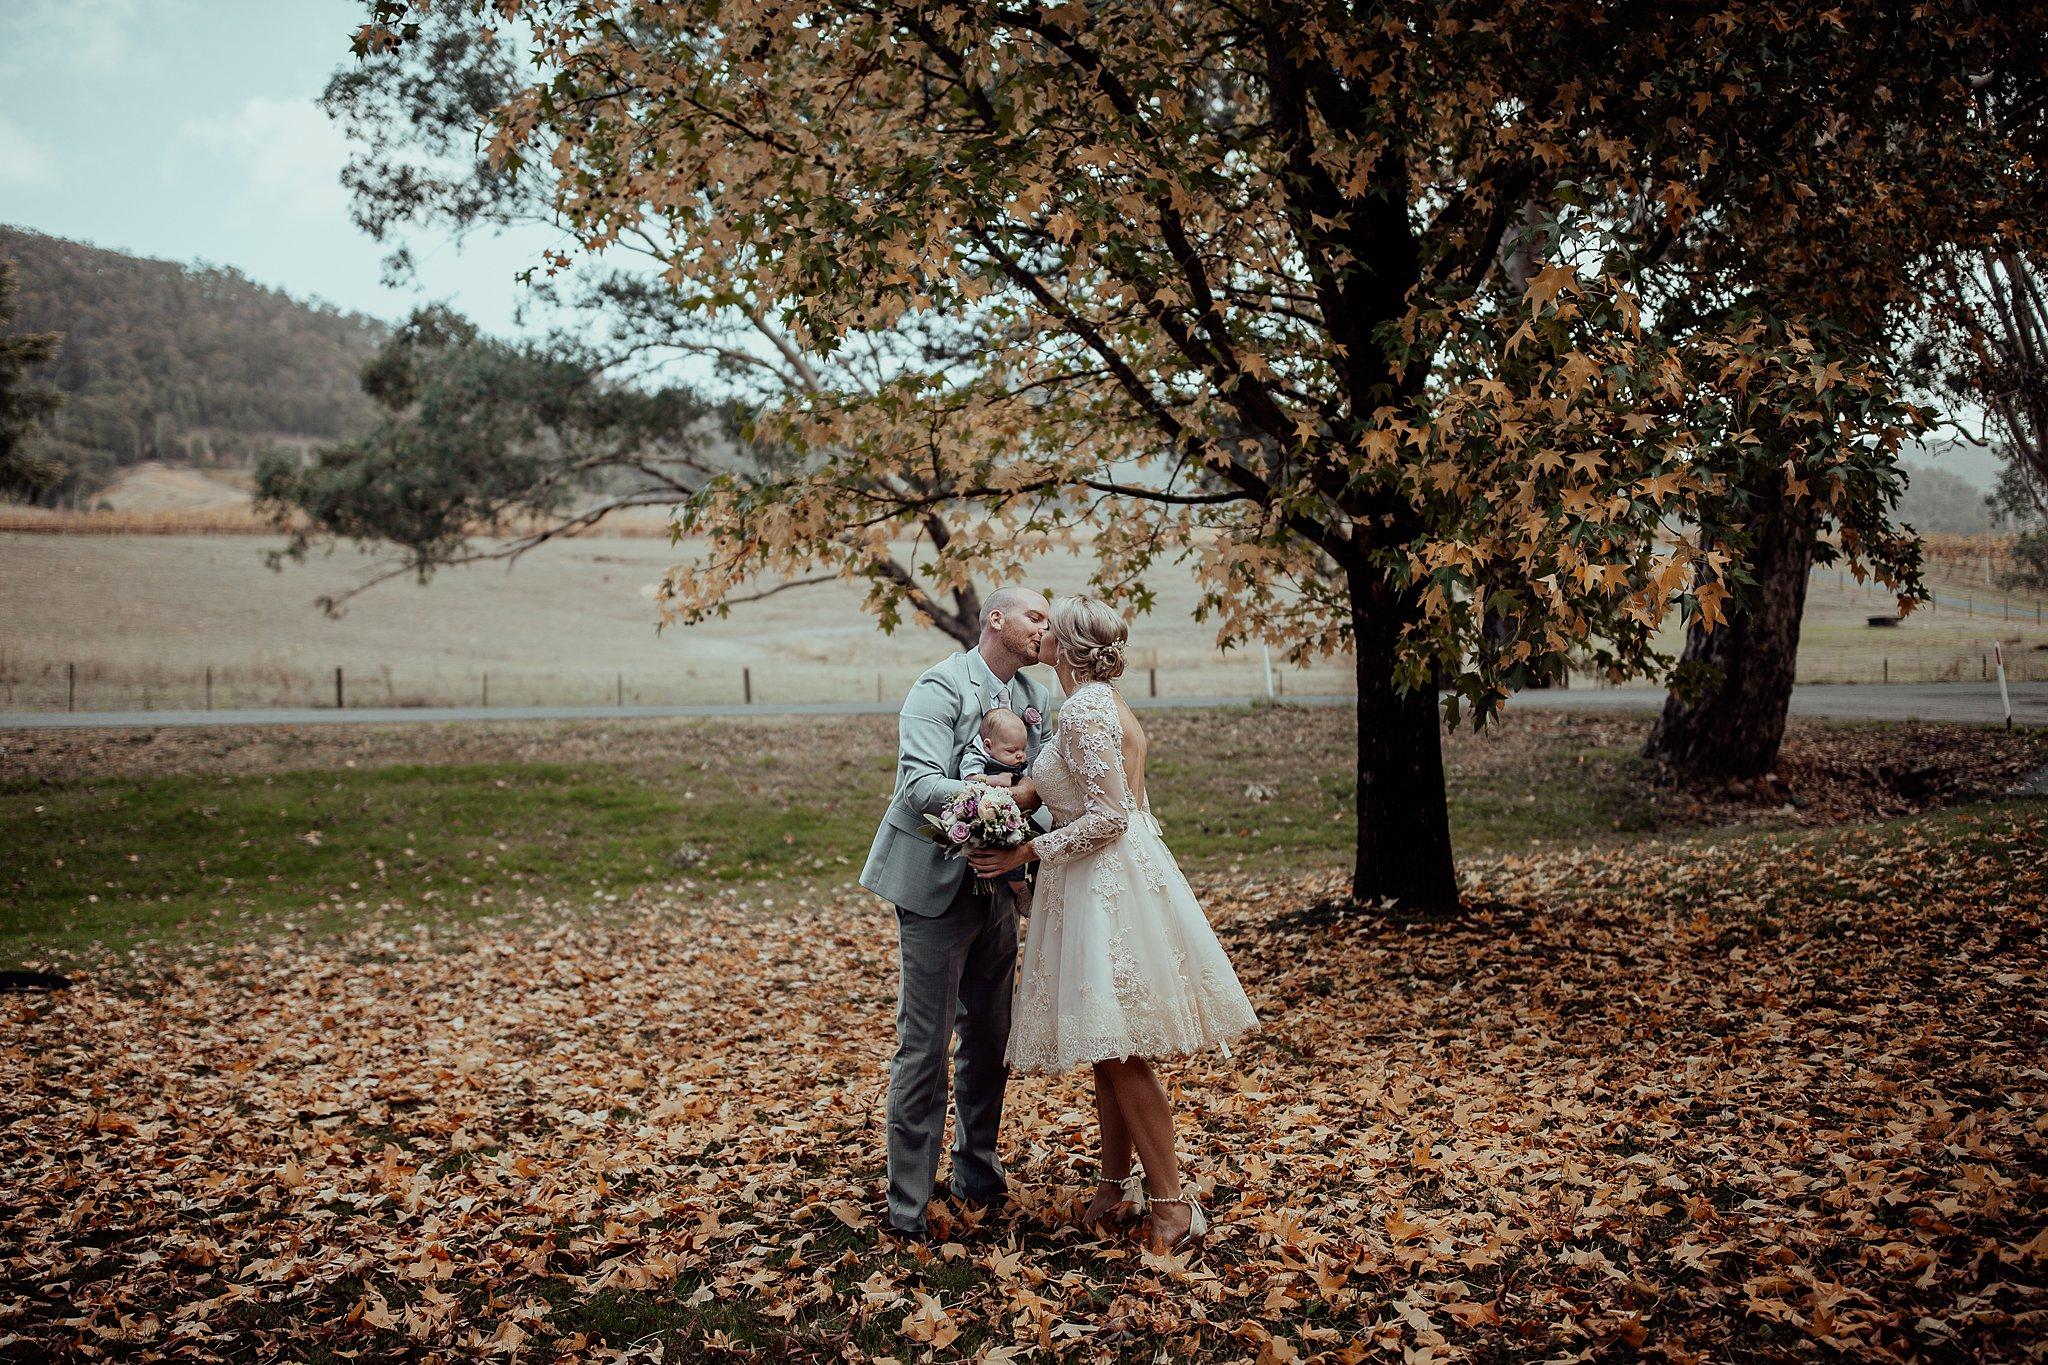 mickalathomas_puremacphotography_weddingphotographer_couplephotographer_Sheppartonphotographer_3409.jpg